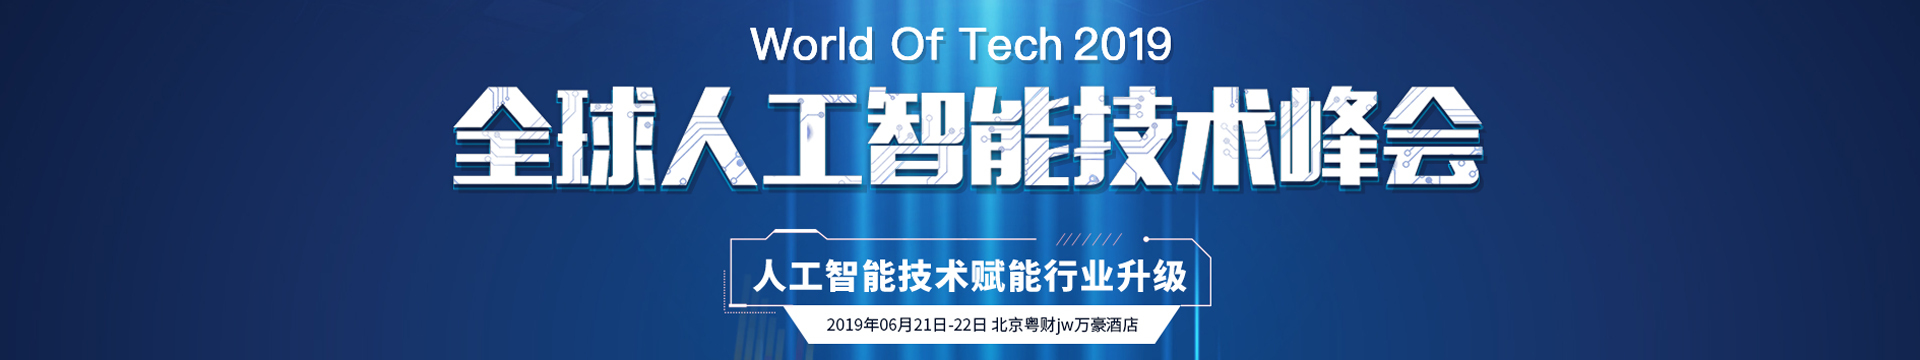 2019 WOT 全球人工智能技术峰会(北京)